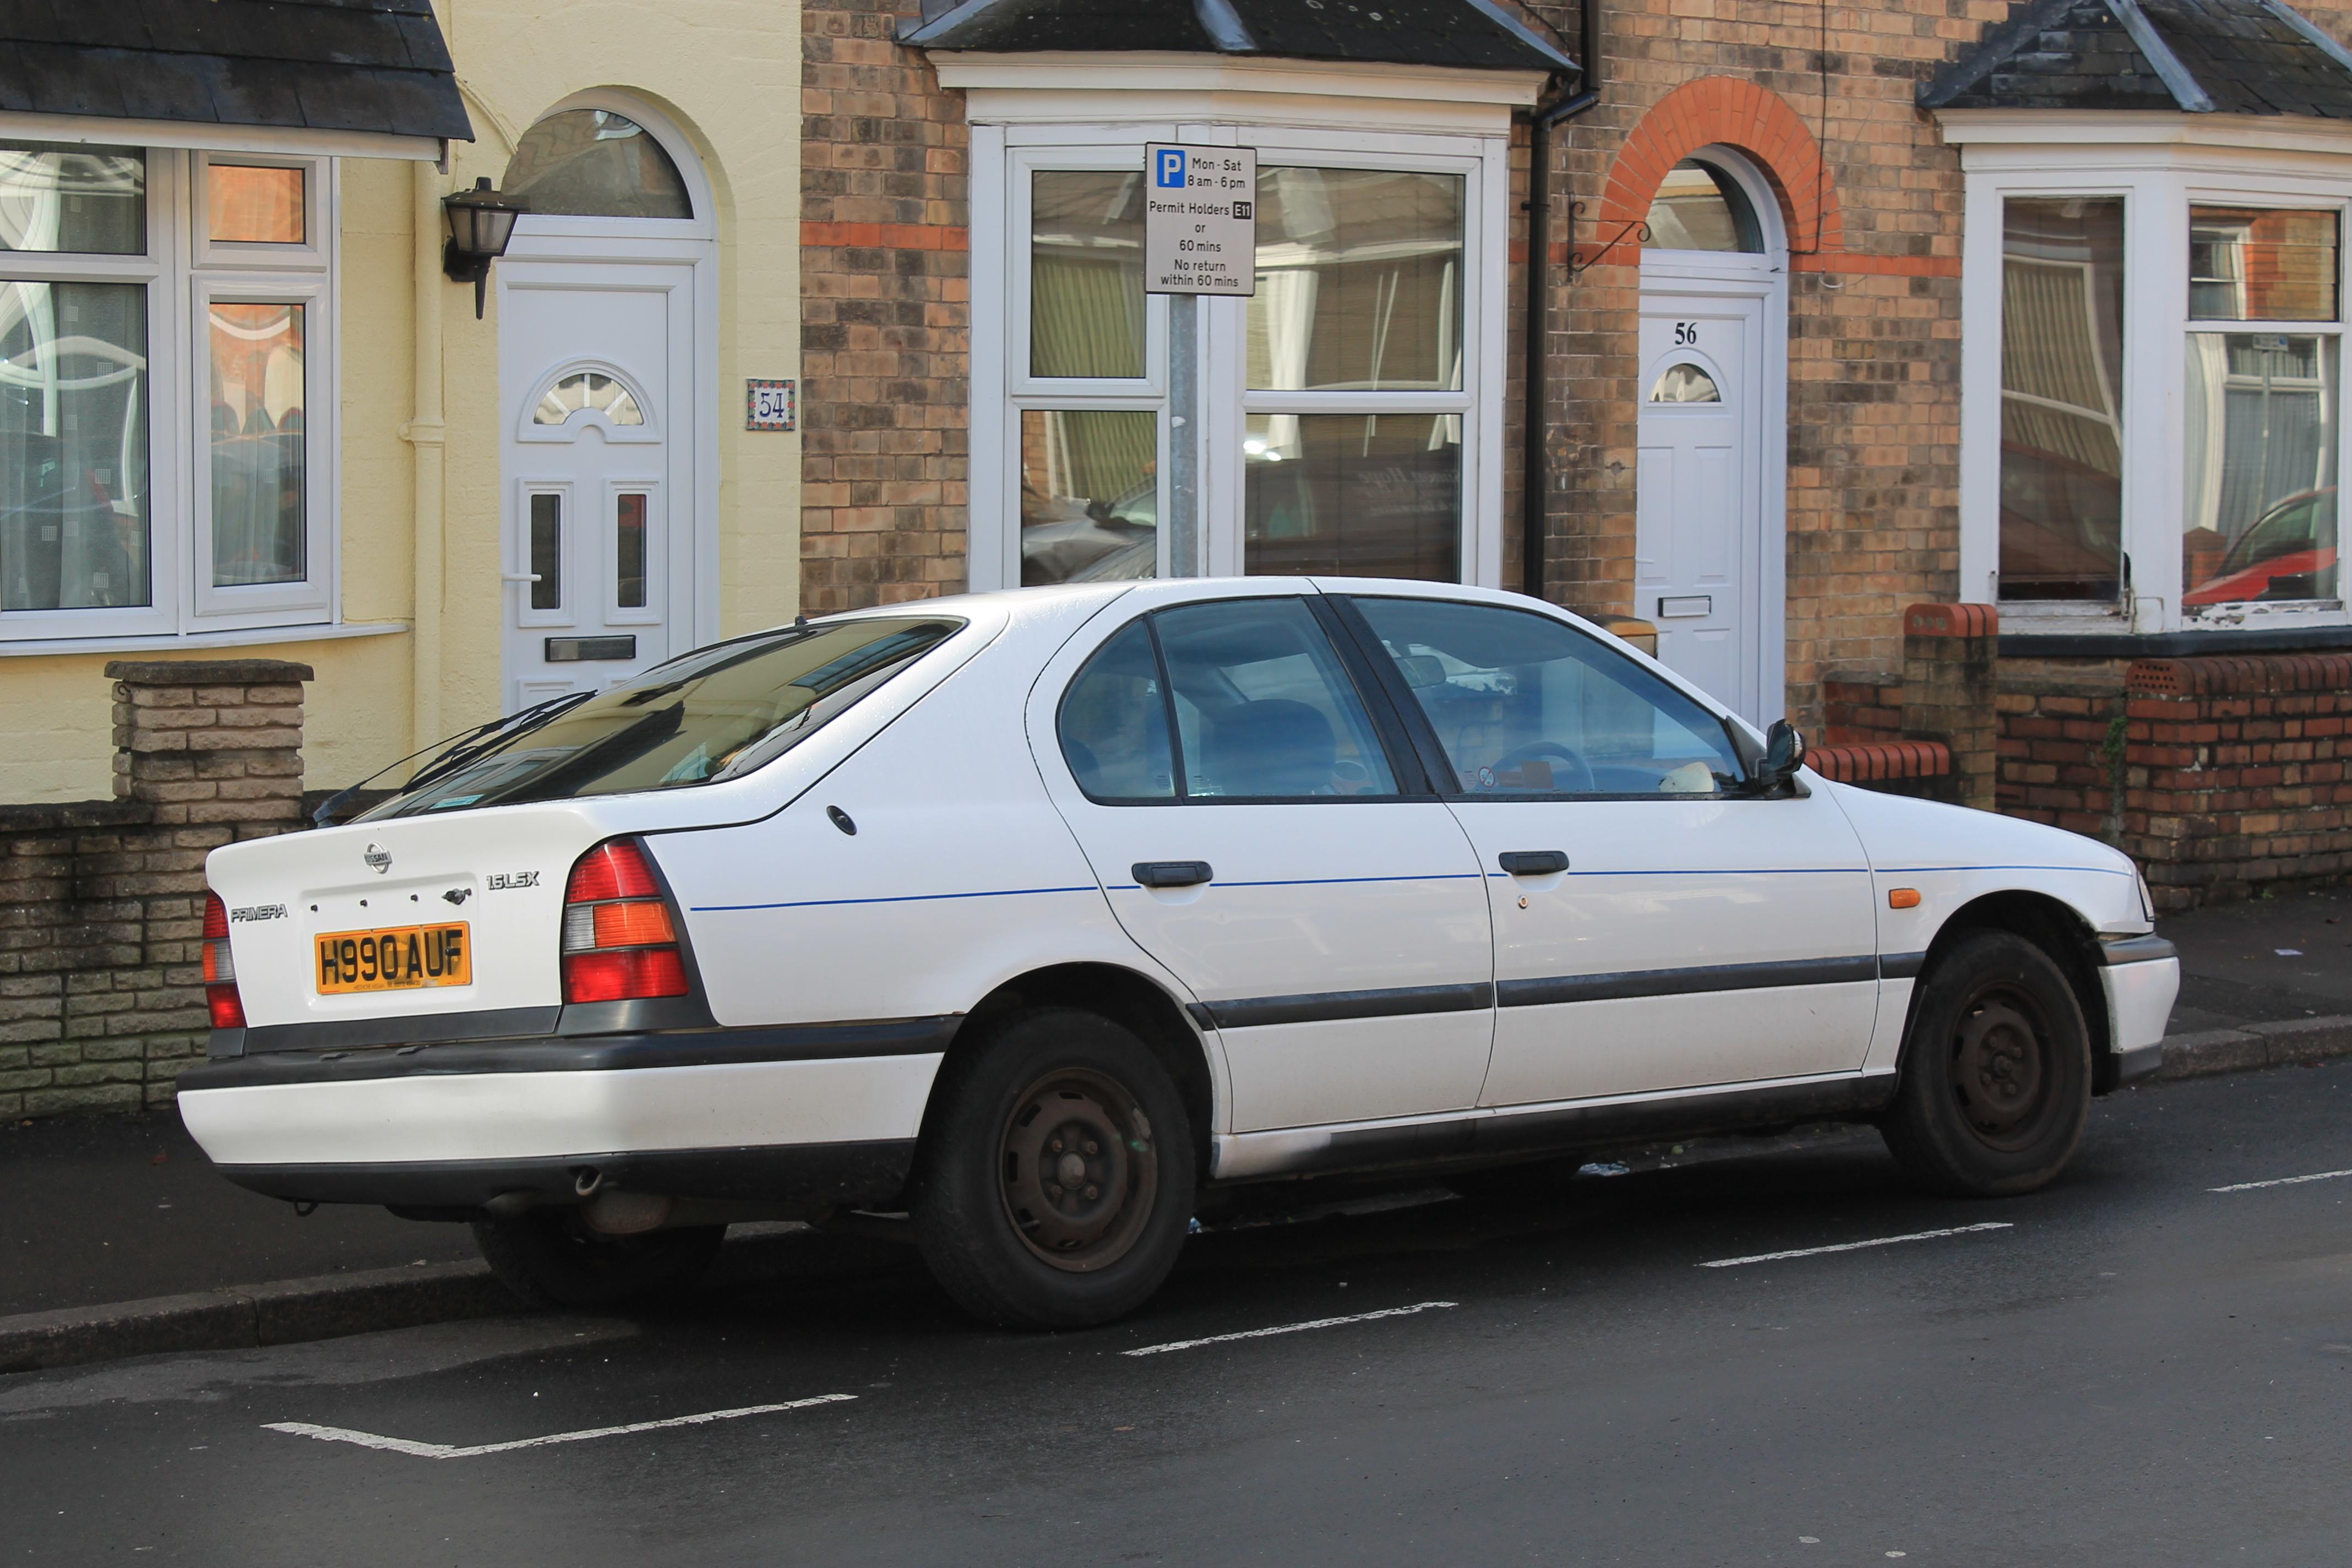 File:1991 Nissan Primera 1.6 LSX (16277712199).jpg - Wikimedia Commons